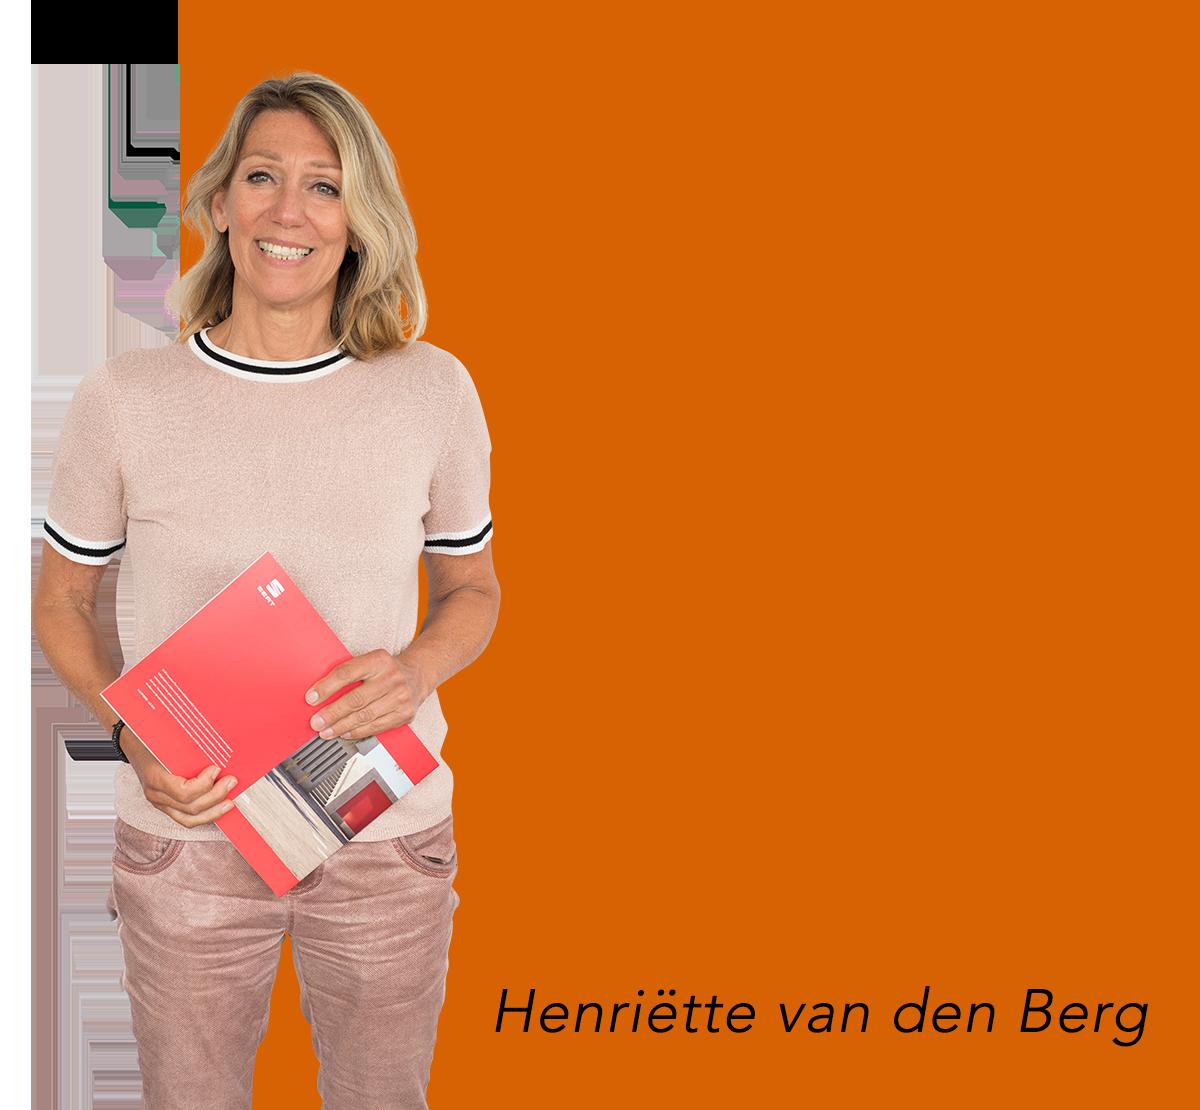 Henriette_vd_Berg_BG_DEF.png